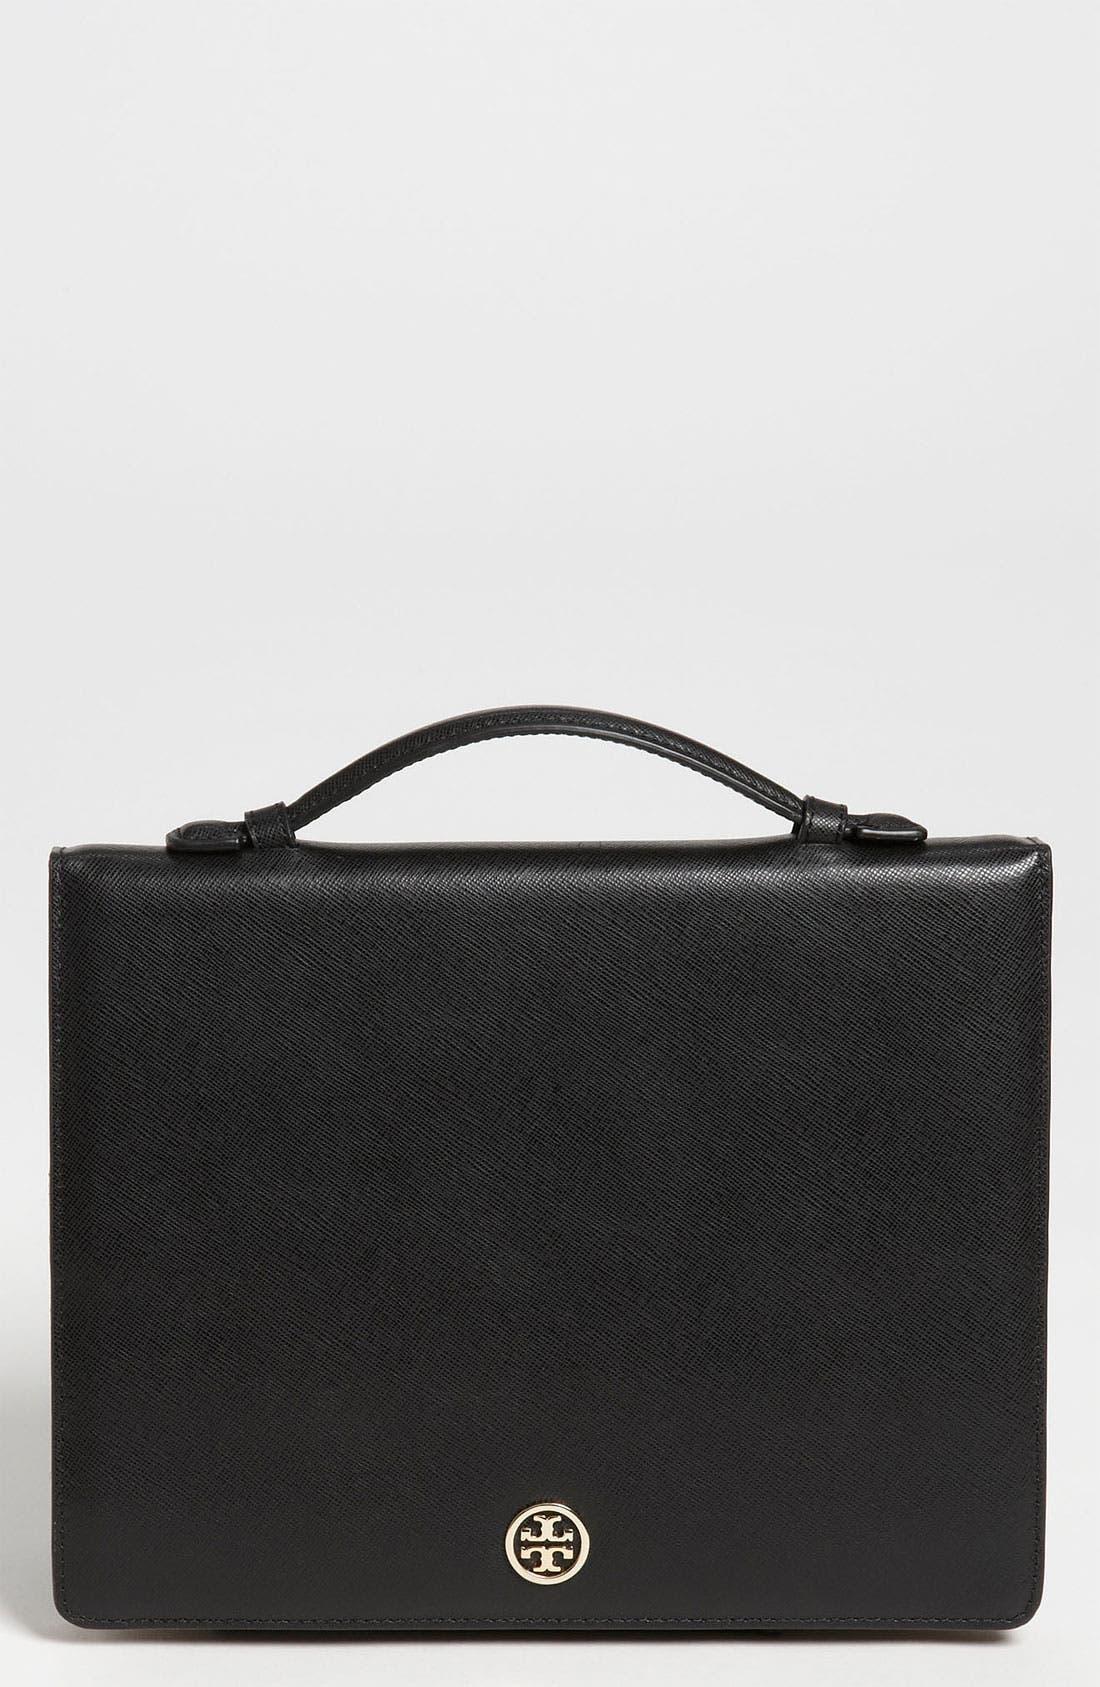 'Robinson' Saffiano Leather Tablet Case,                             Main thumbnail 1, color,                             001